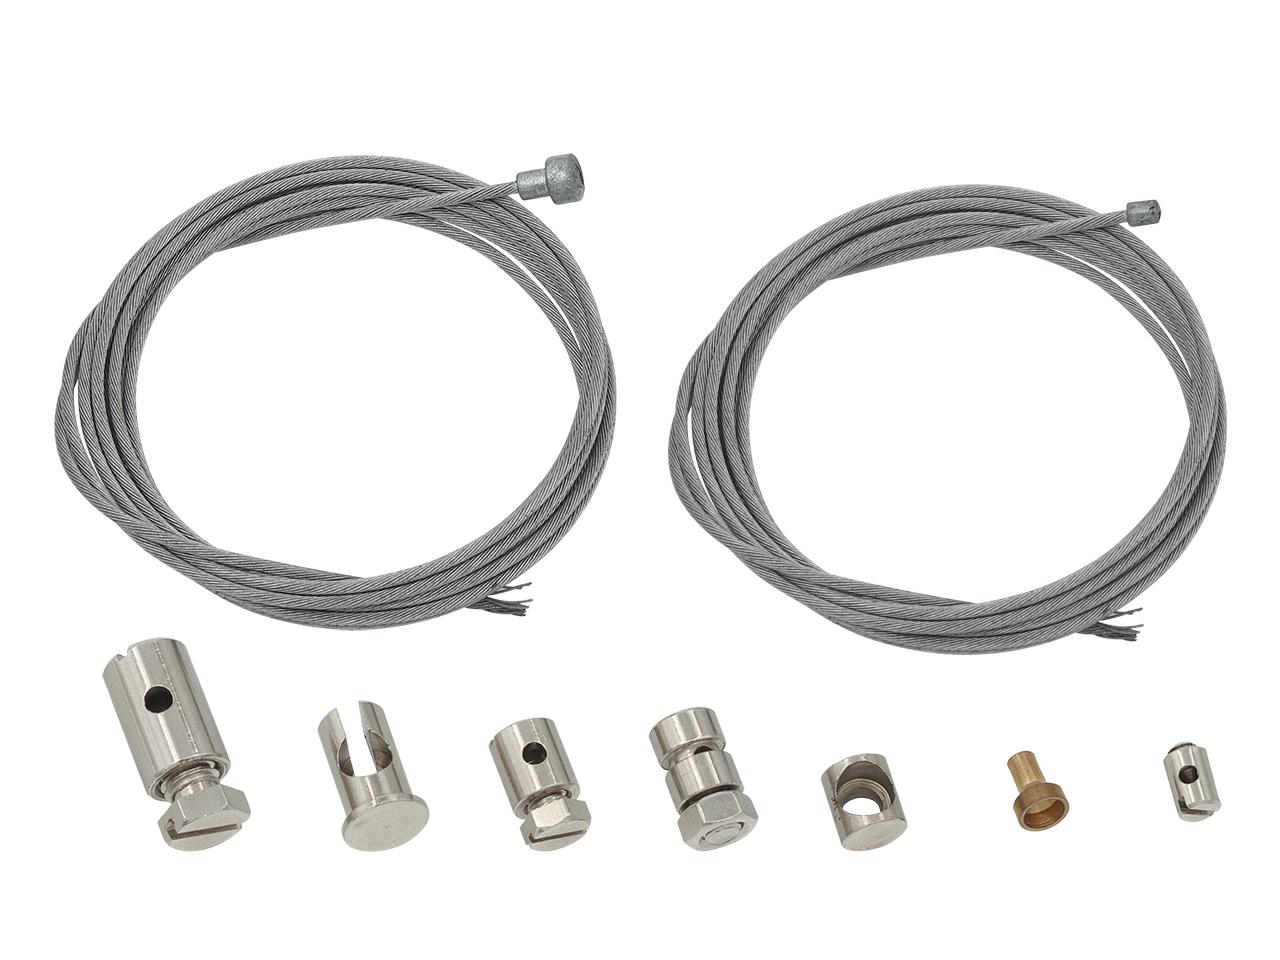 Kit de cabos de embraiagem universal (2 cabos + 7 terminais